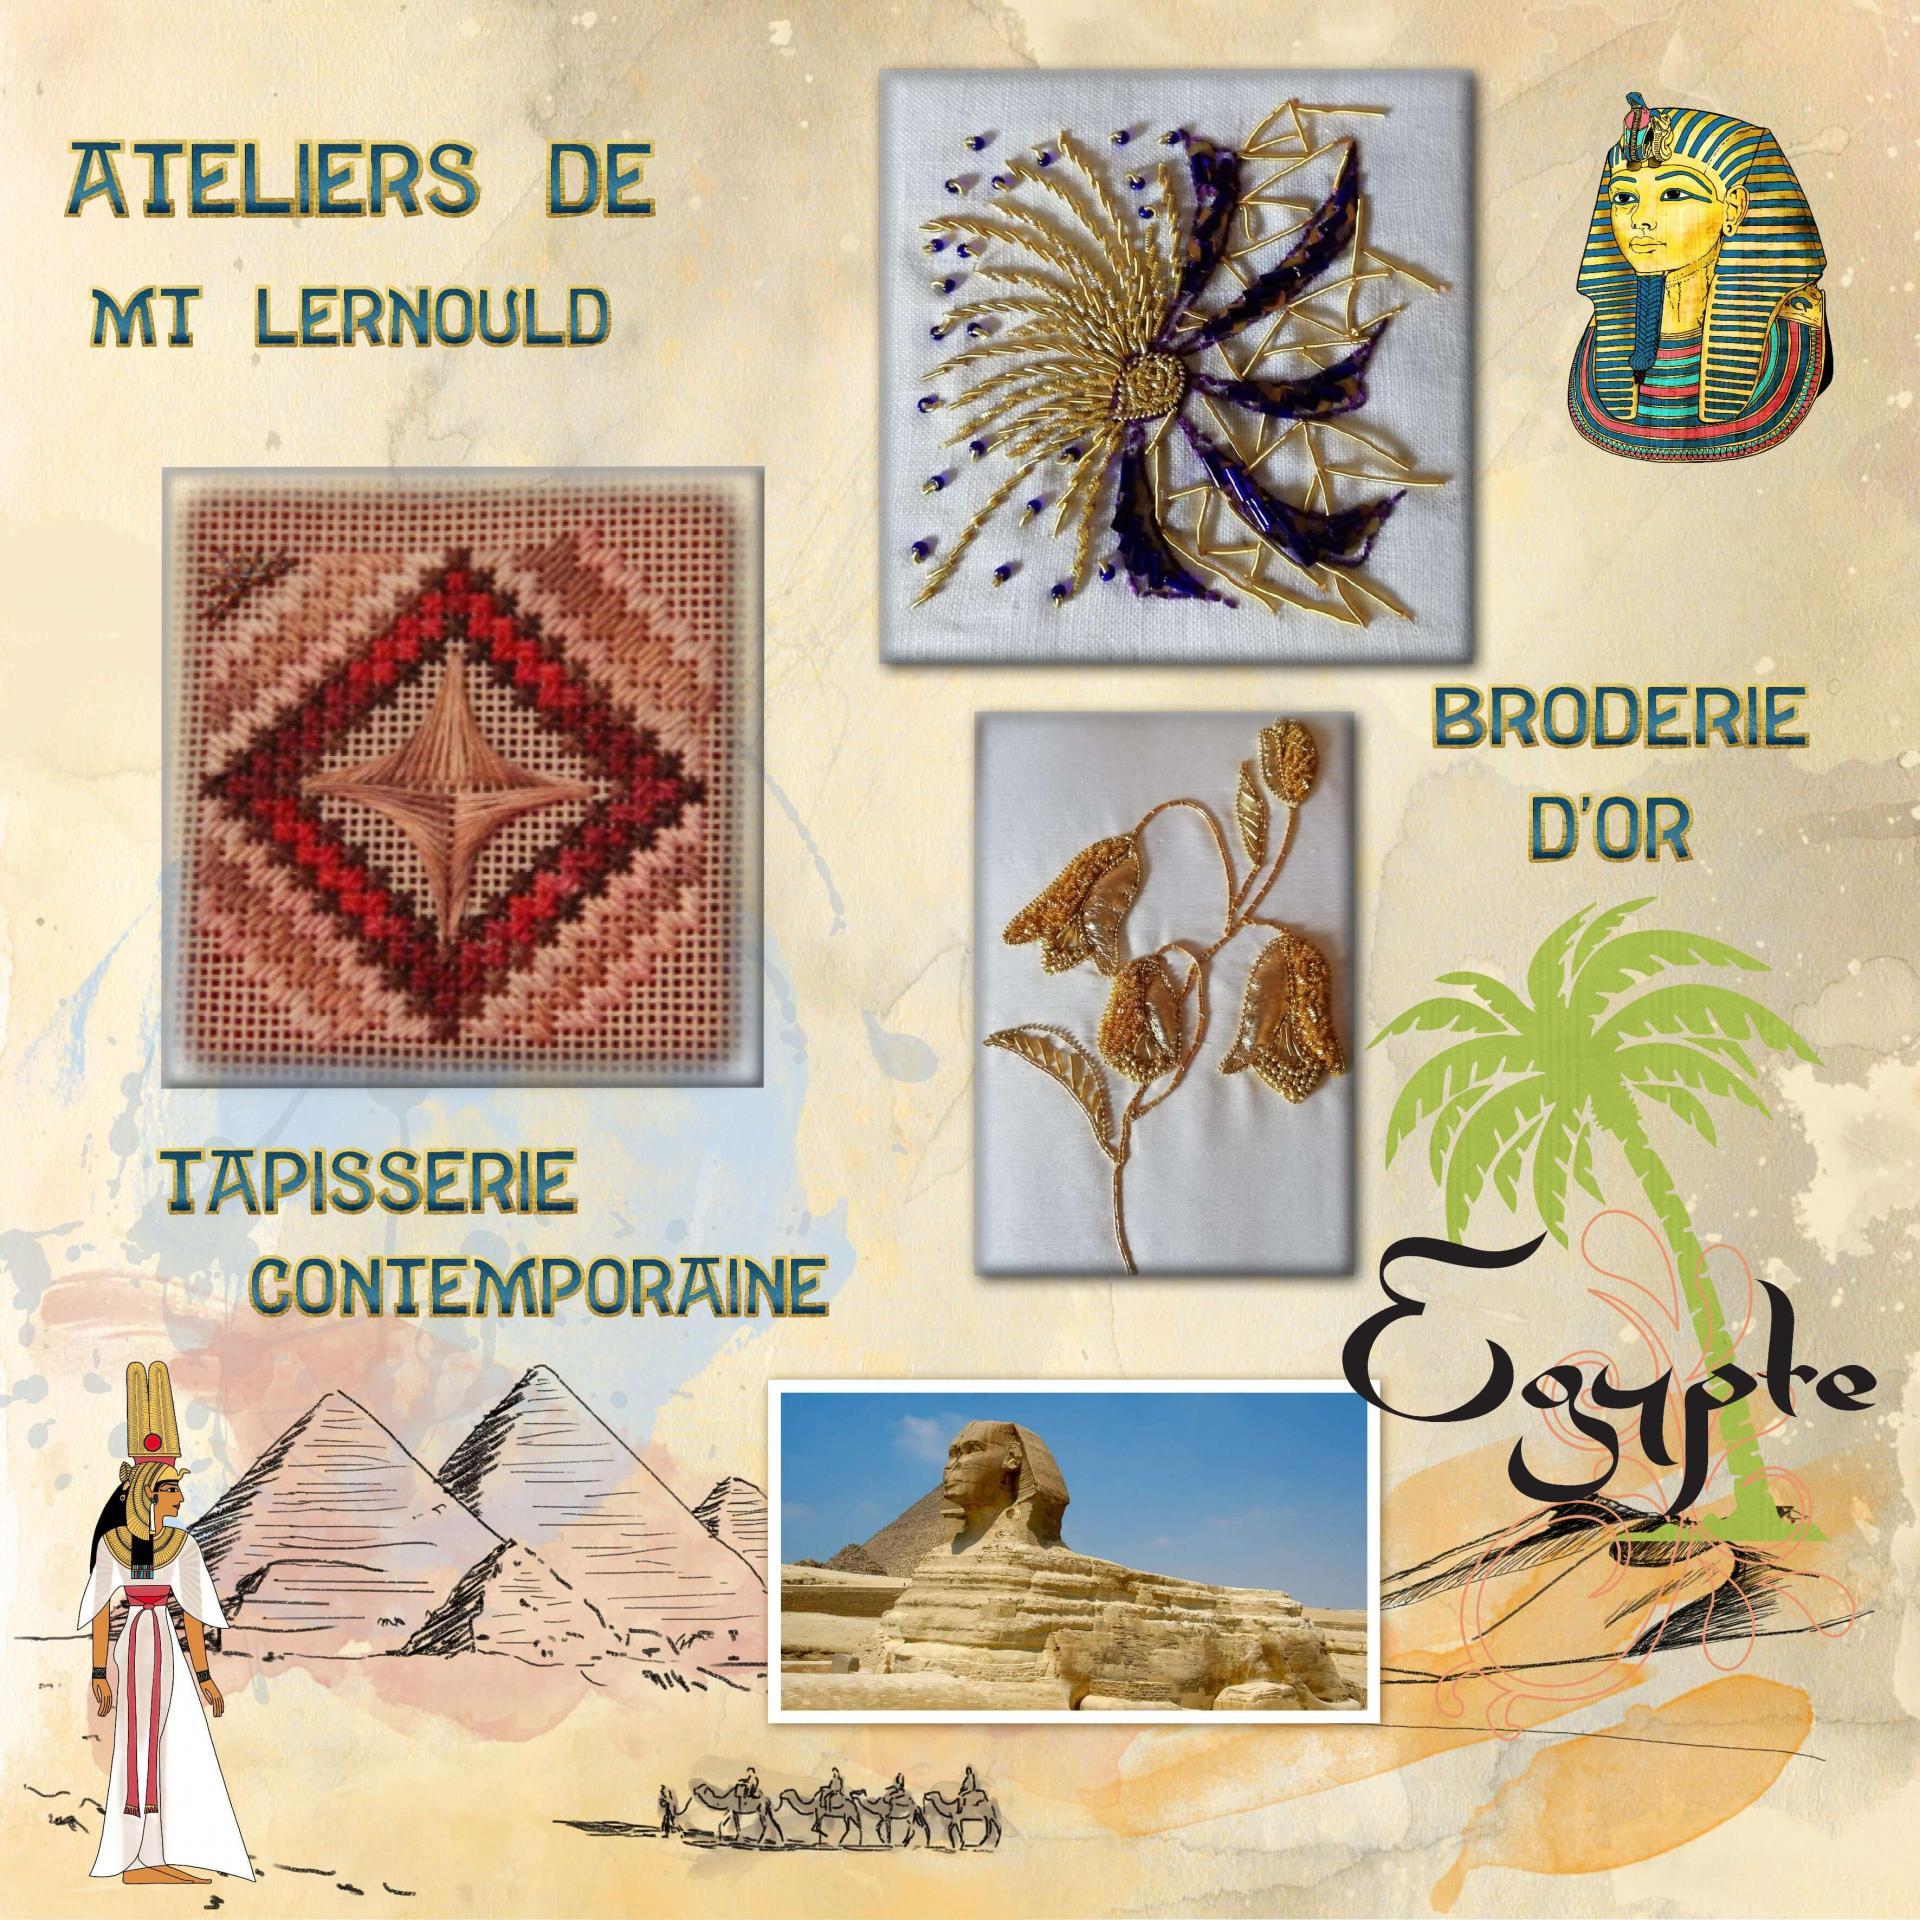 05 lernould egypte